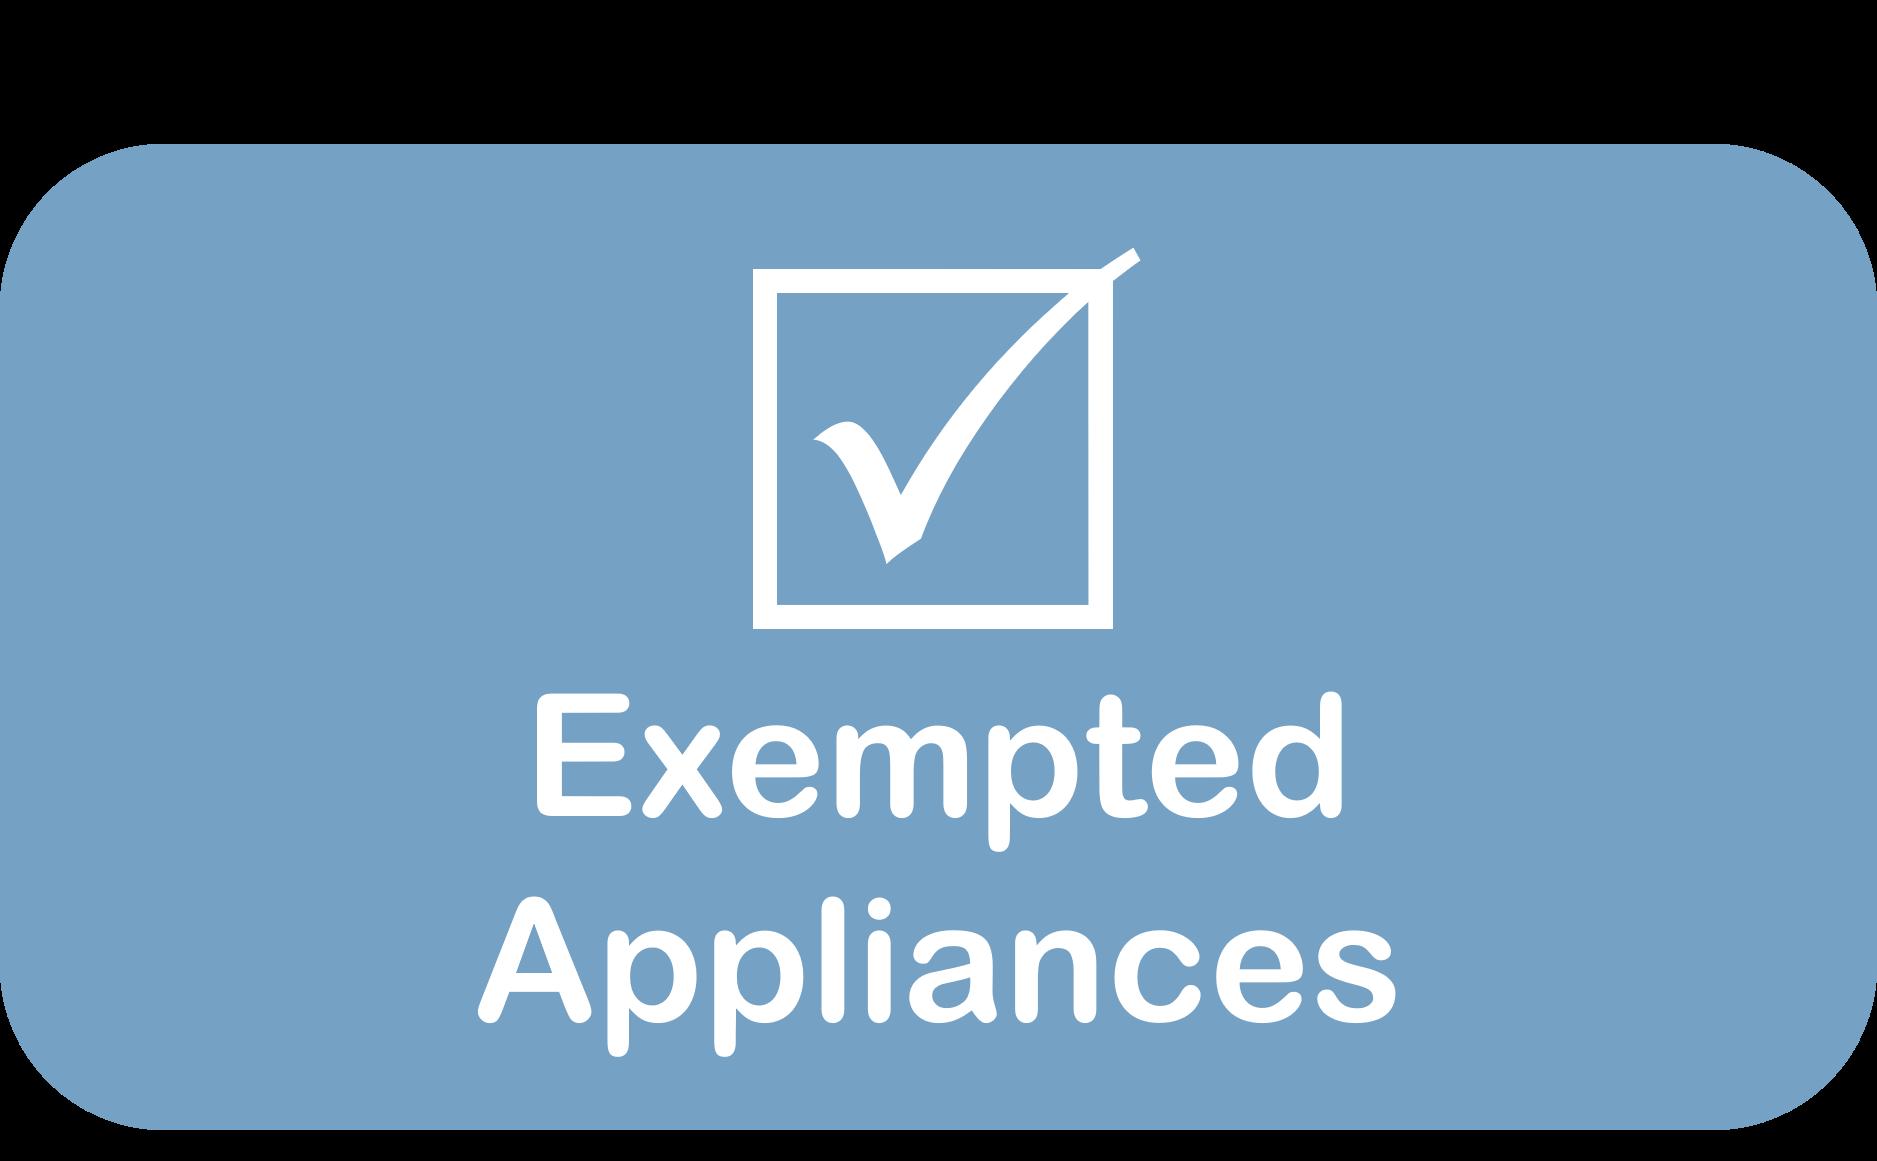 Exempted Appliances Button